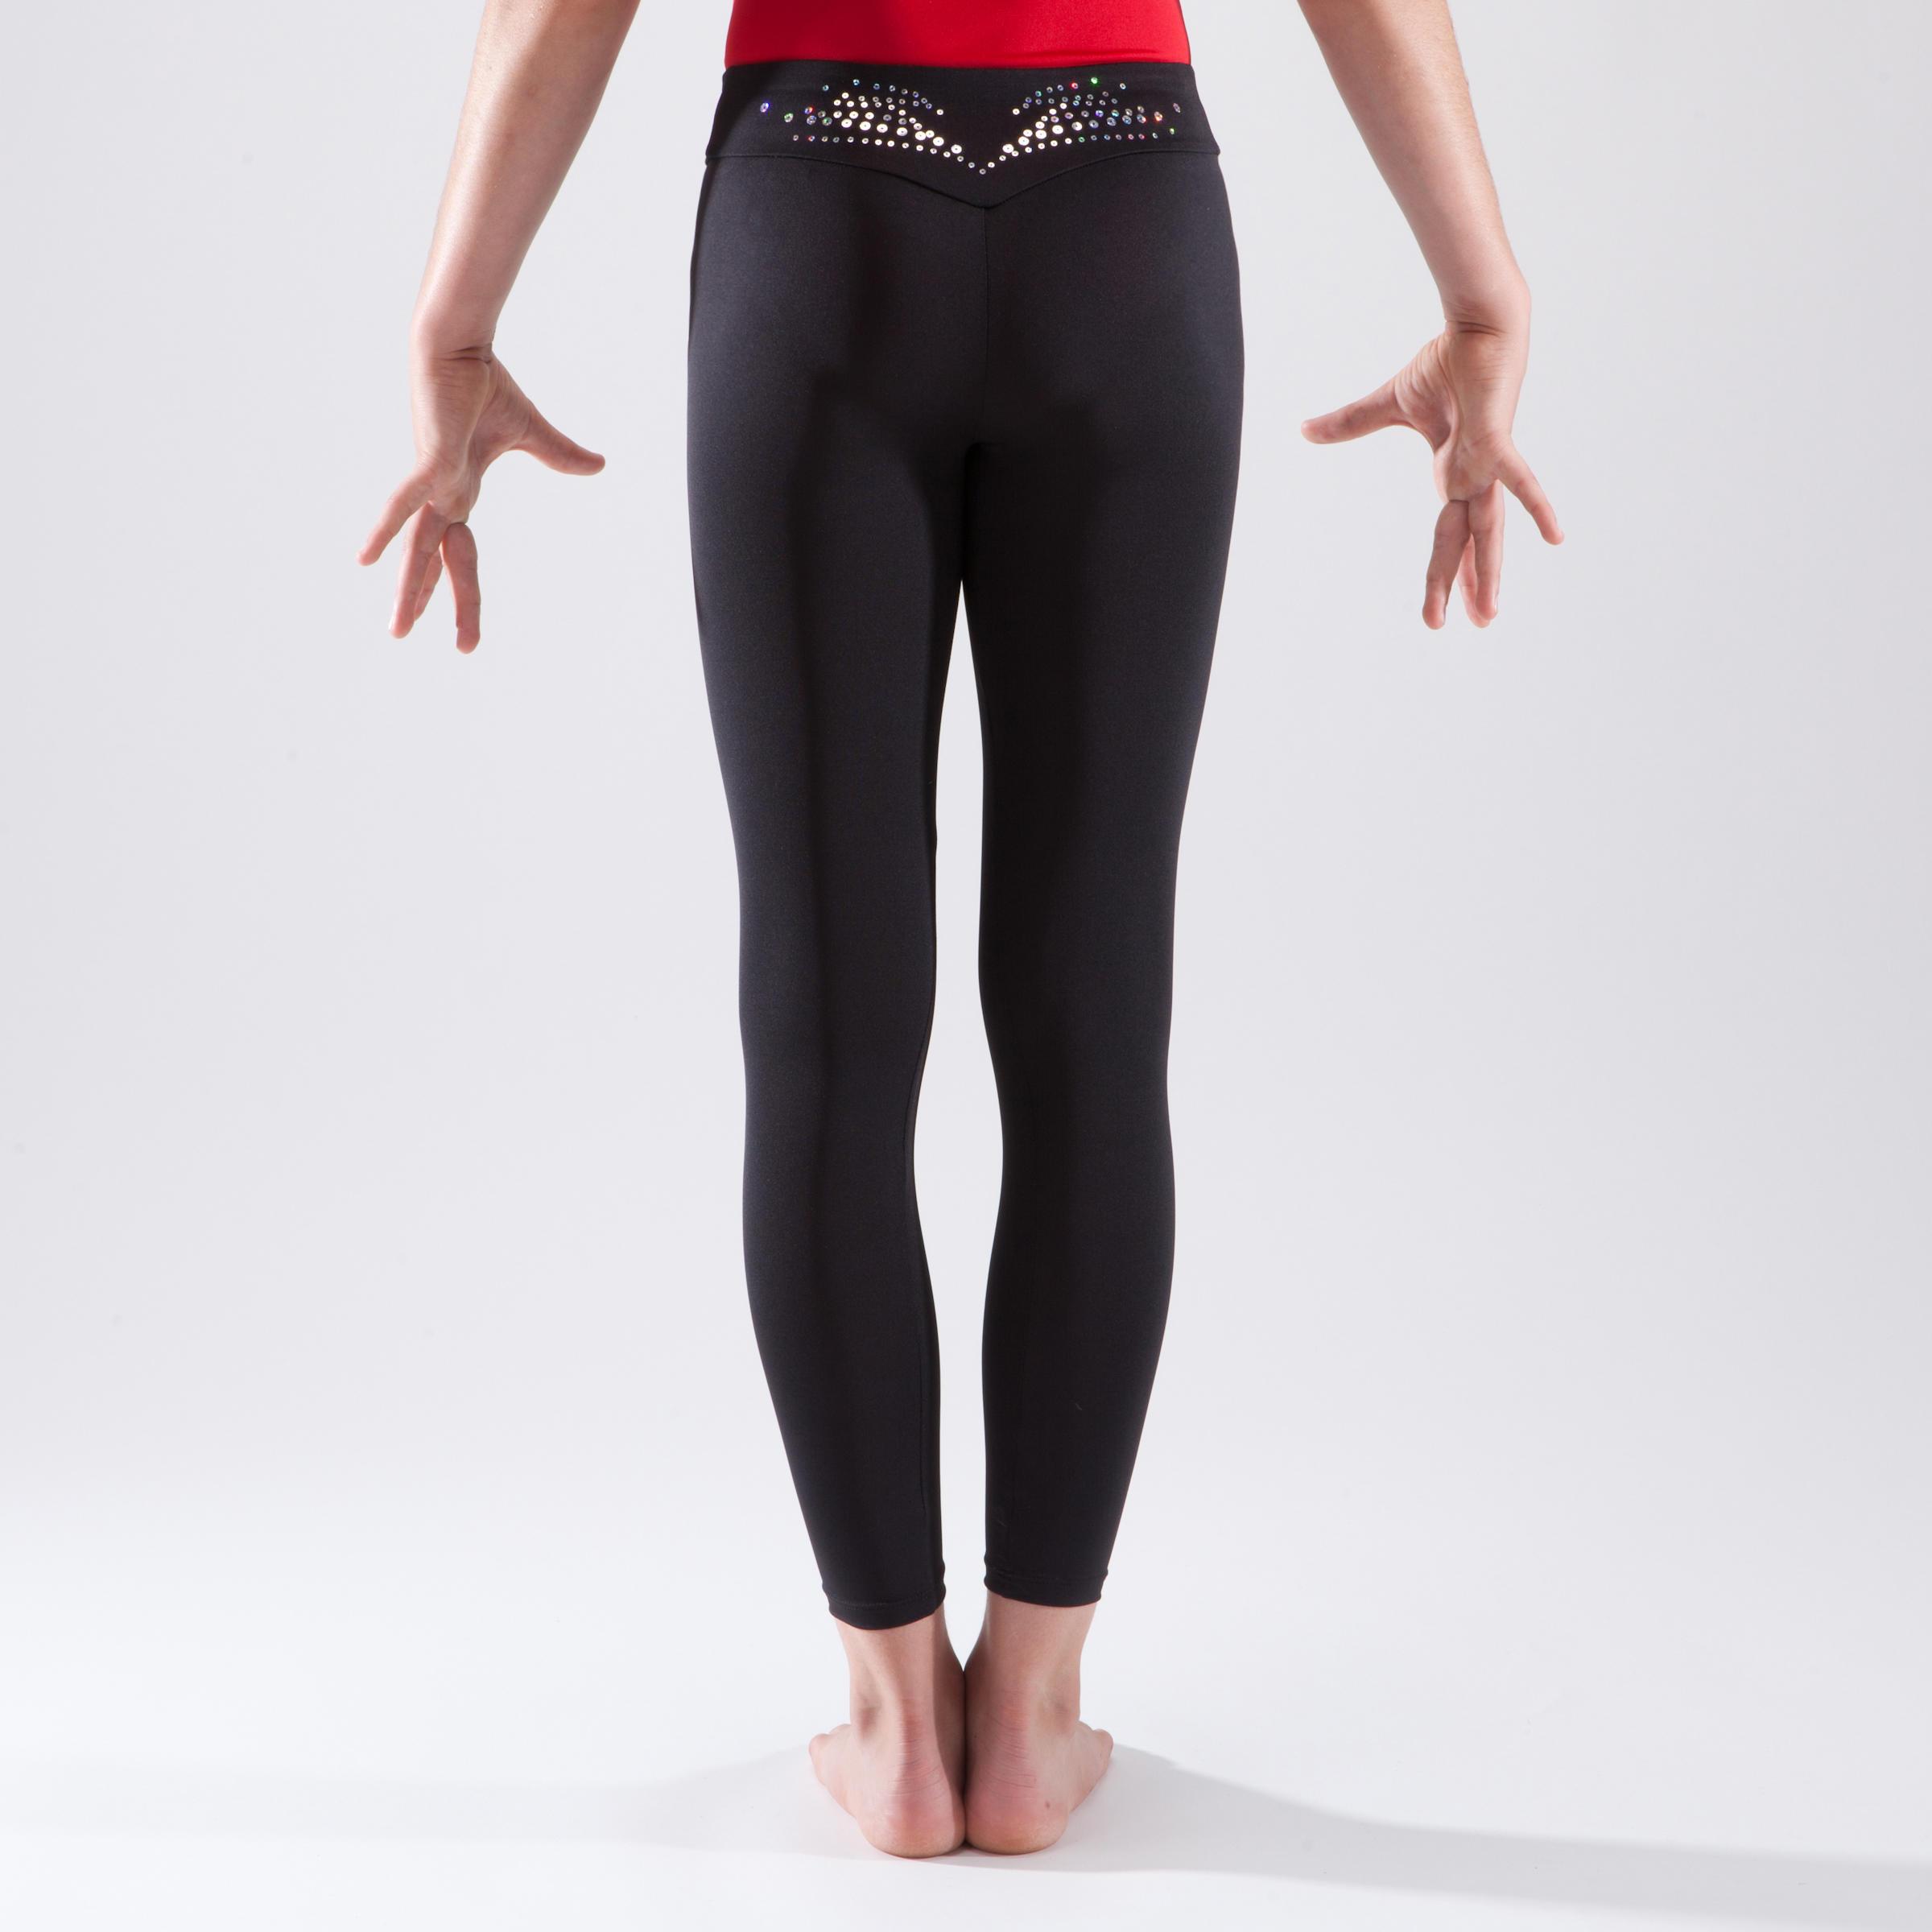 Girls' Artistic Gymnastics Leggings - Black/Sequins